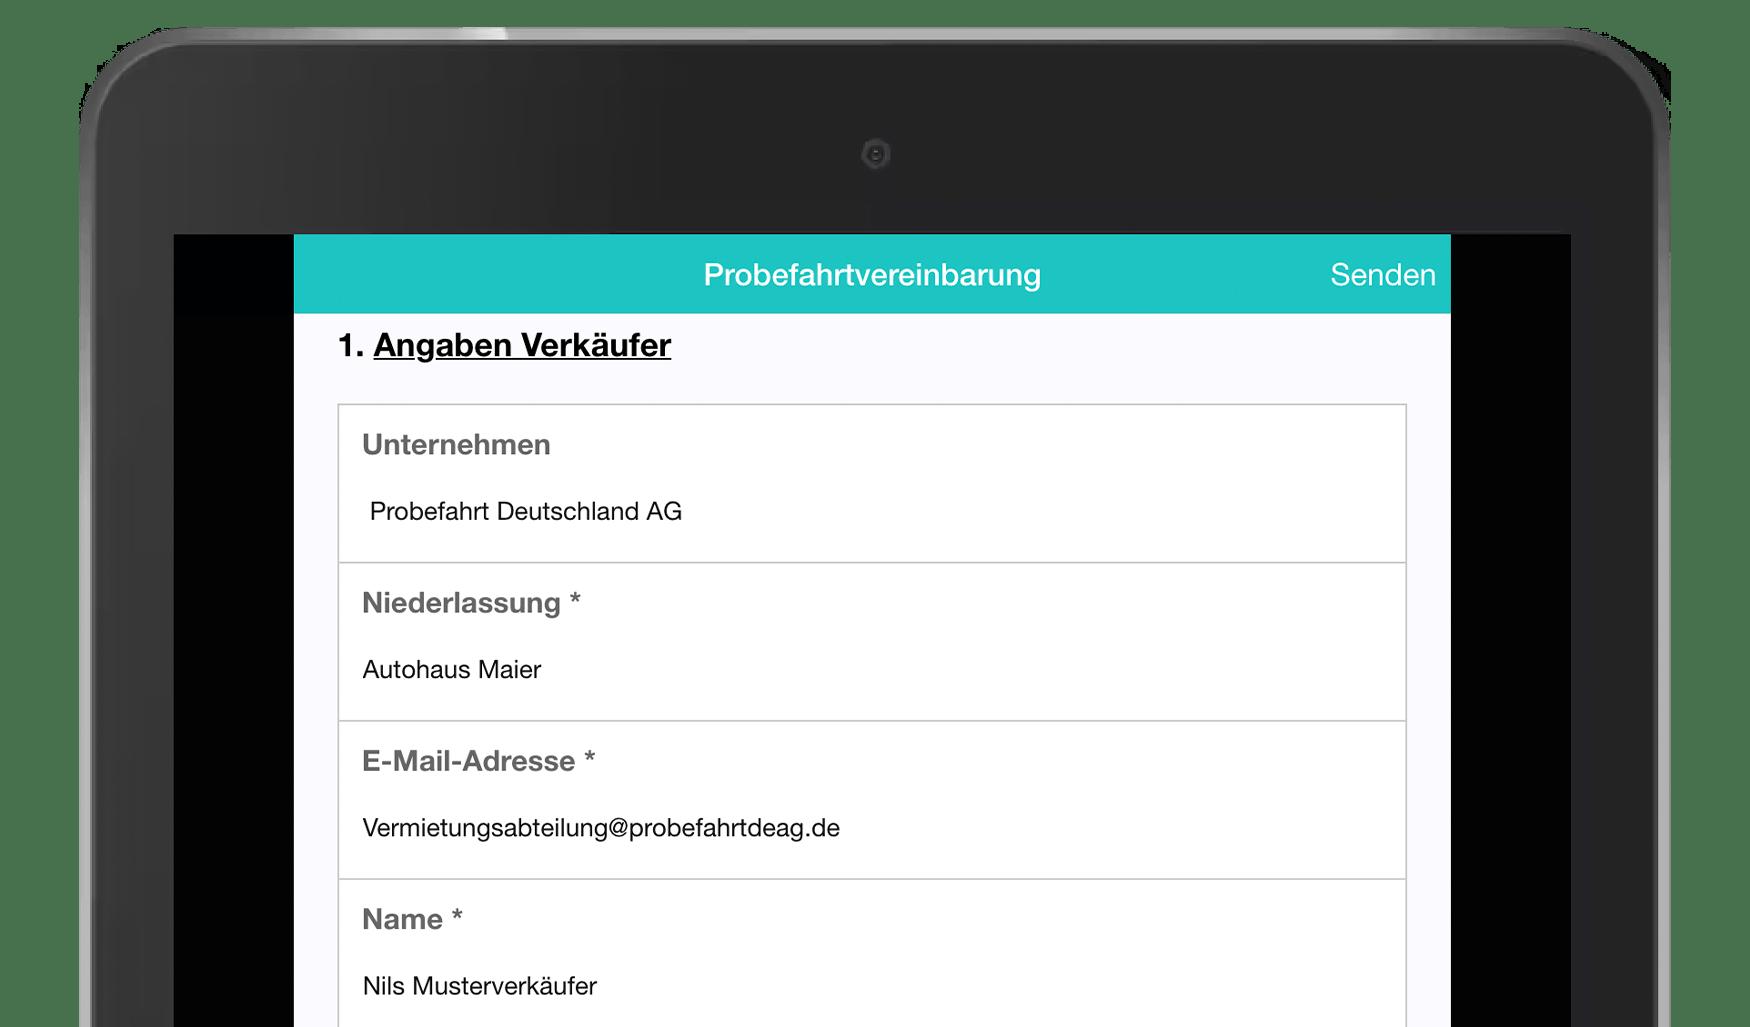 MoreApp Probefahrtvereinbarungs-App